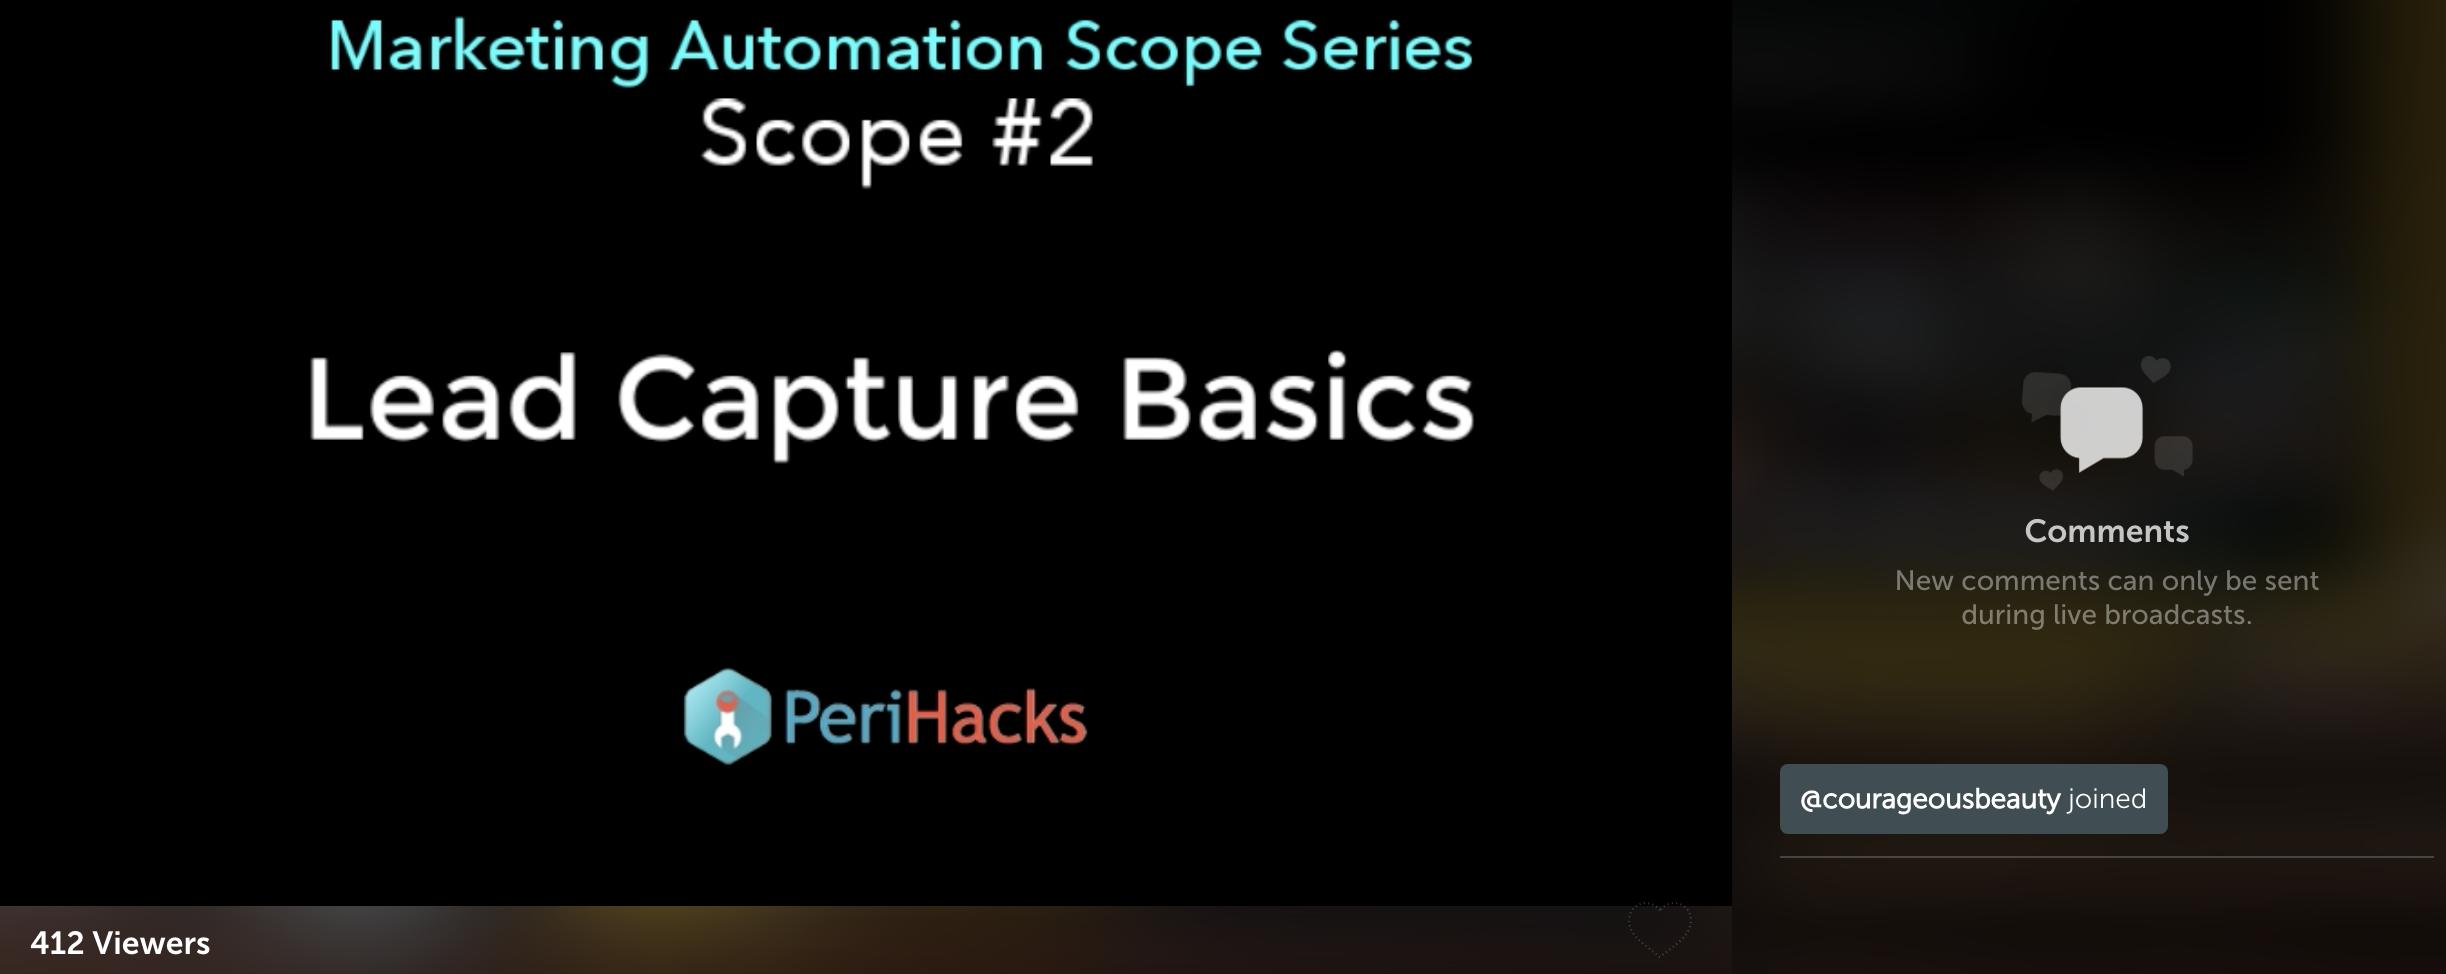 Screenshot showing a webinar by PeriHacks